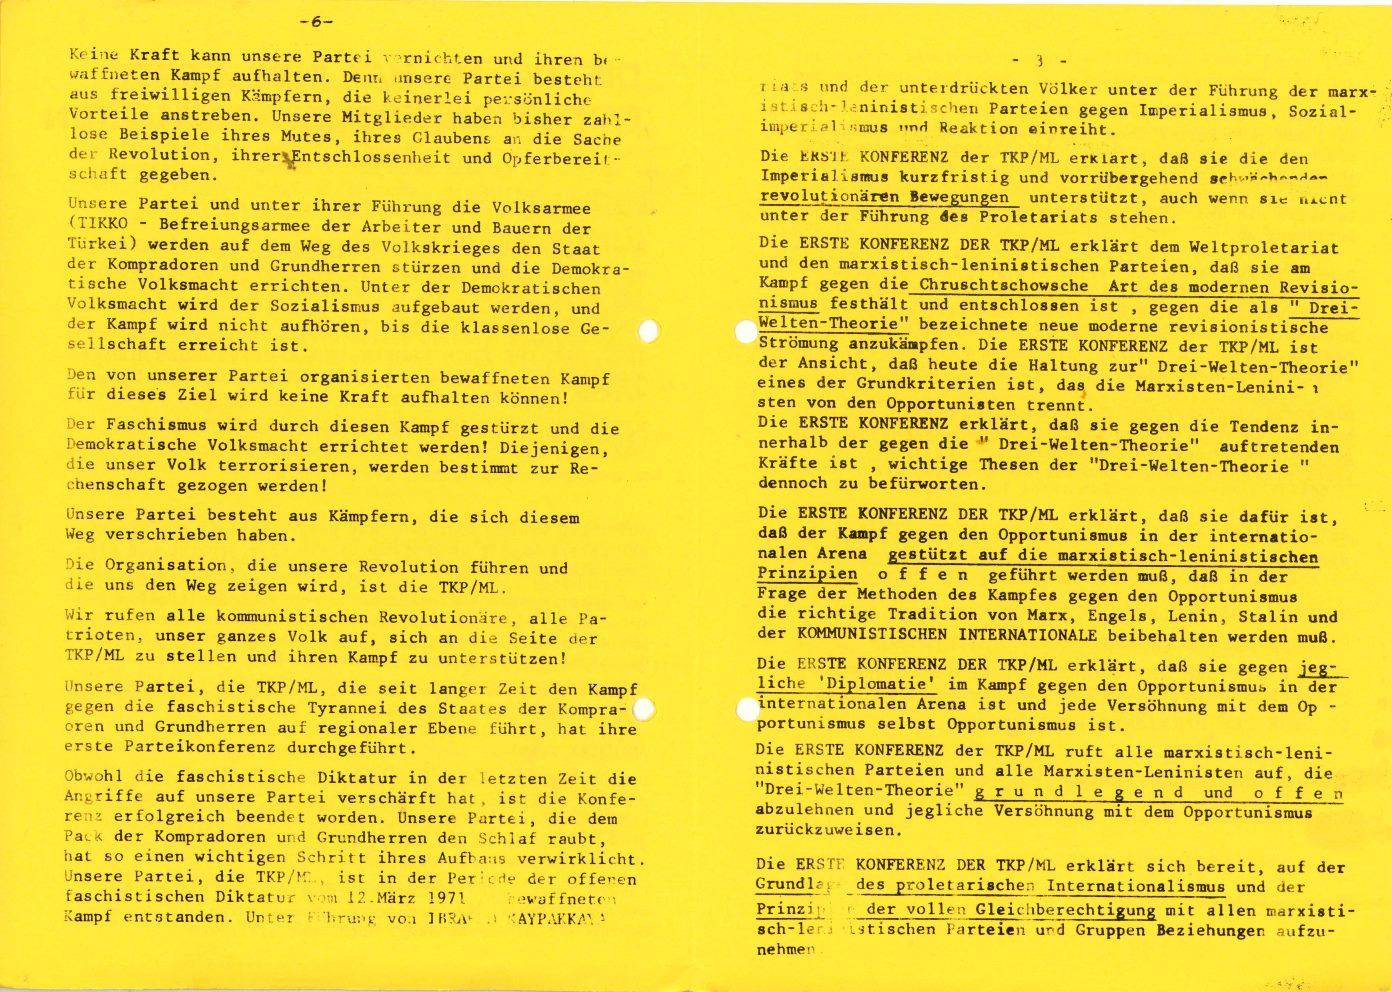 TKPML_1978_06_03